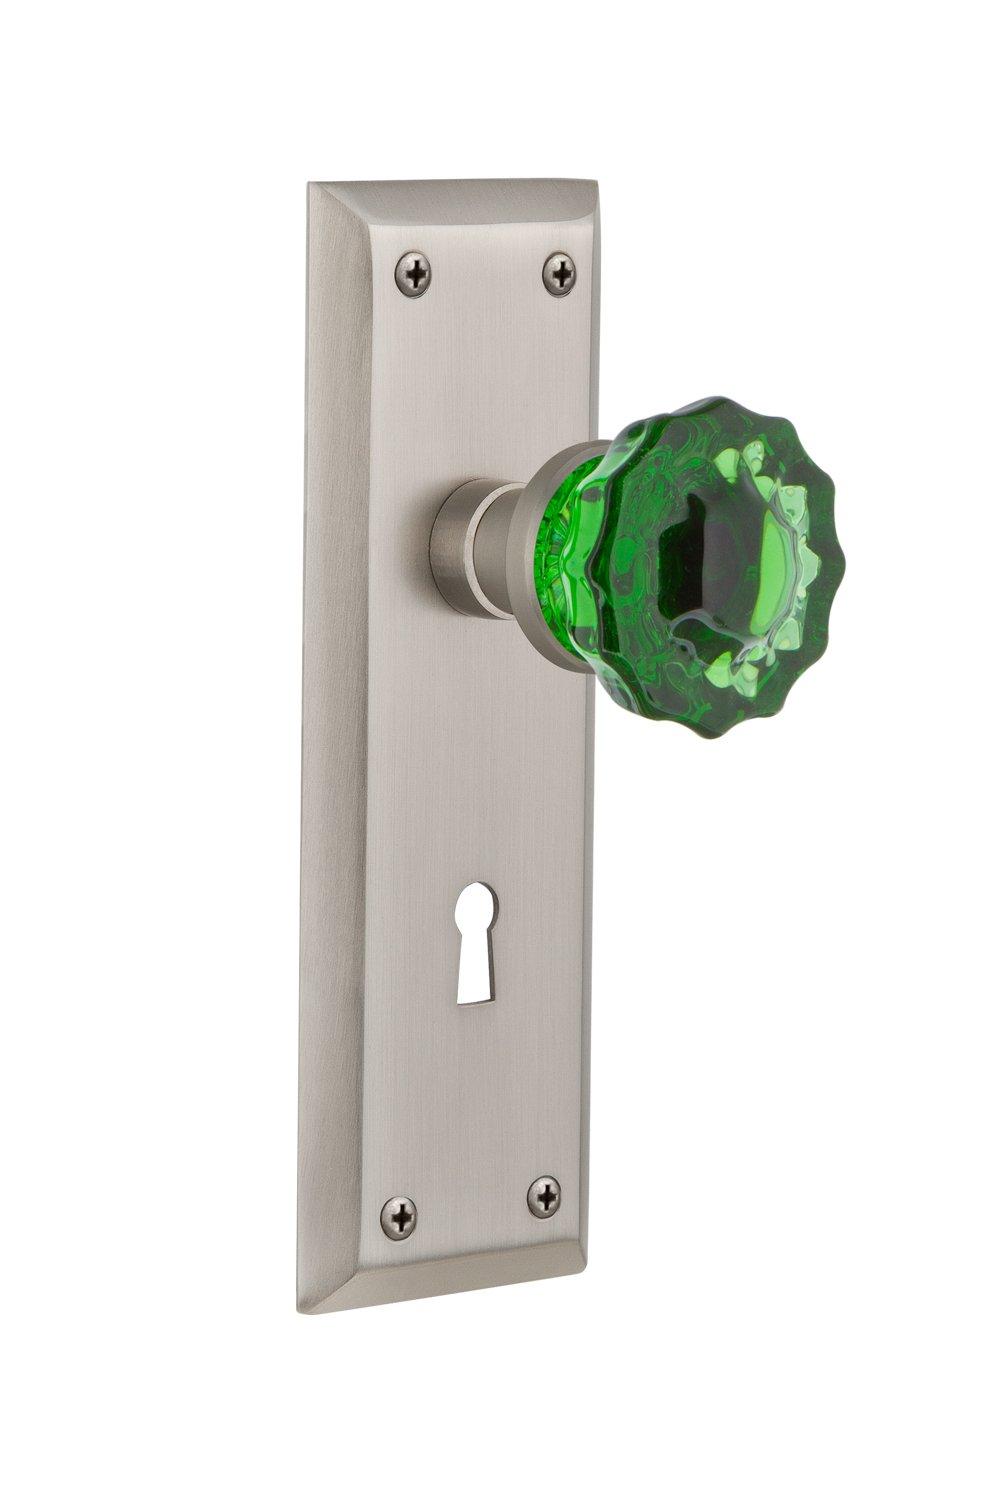 2.75 Nostalgic Warehouse 721818 New York Plate with Keyhole Passage Crystal Emerald Glass Door Knob in Satin Nickel